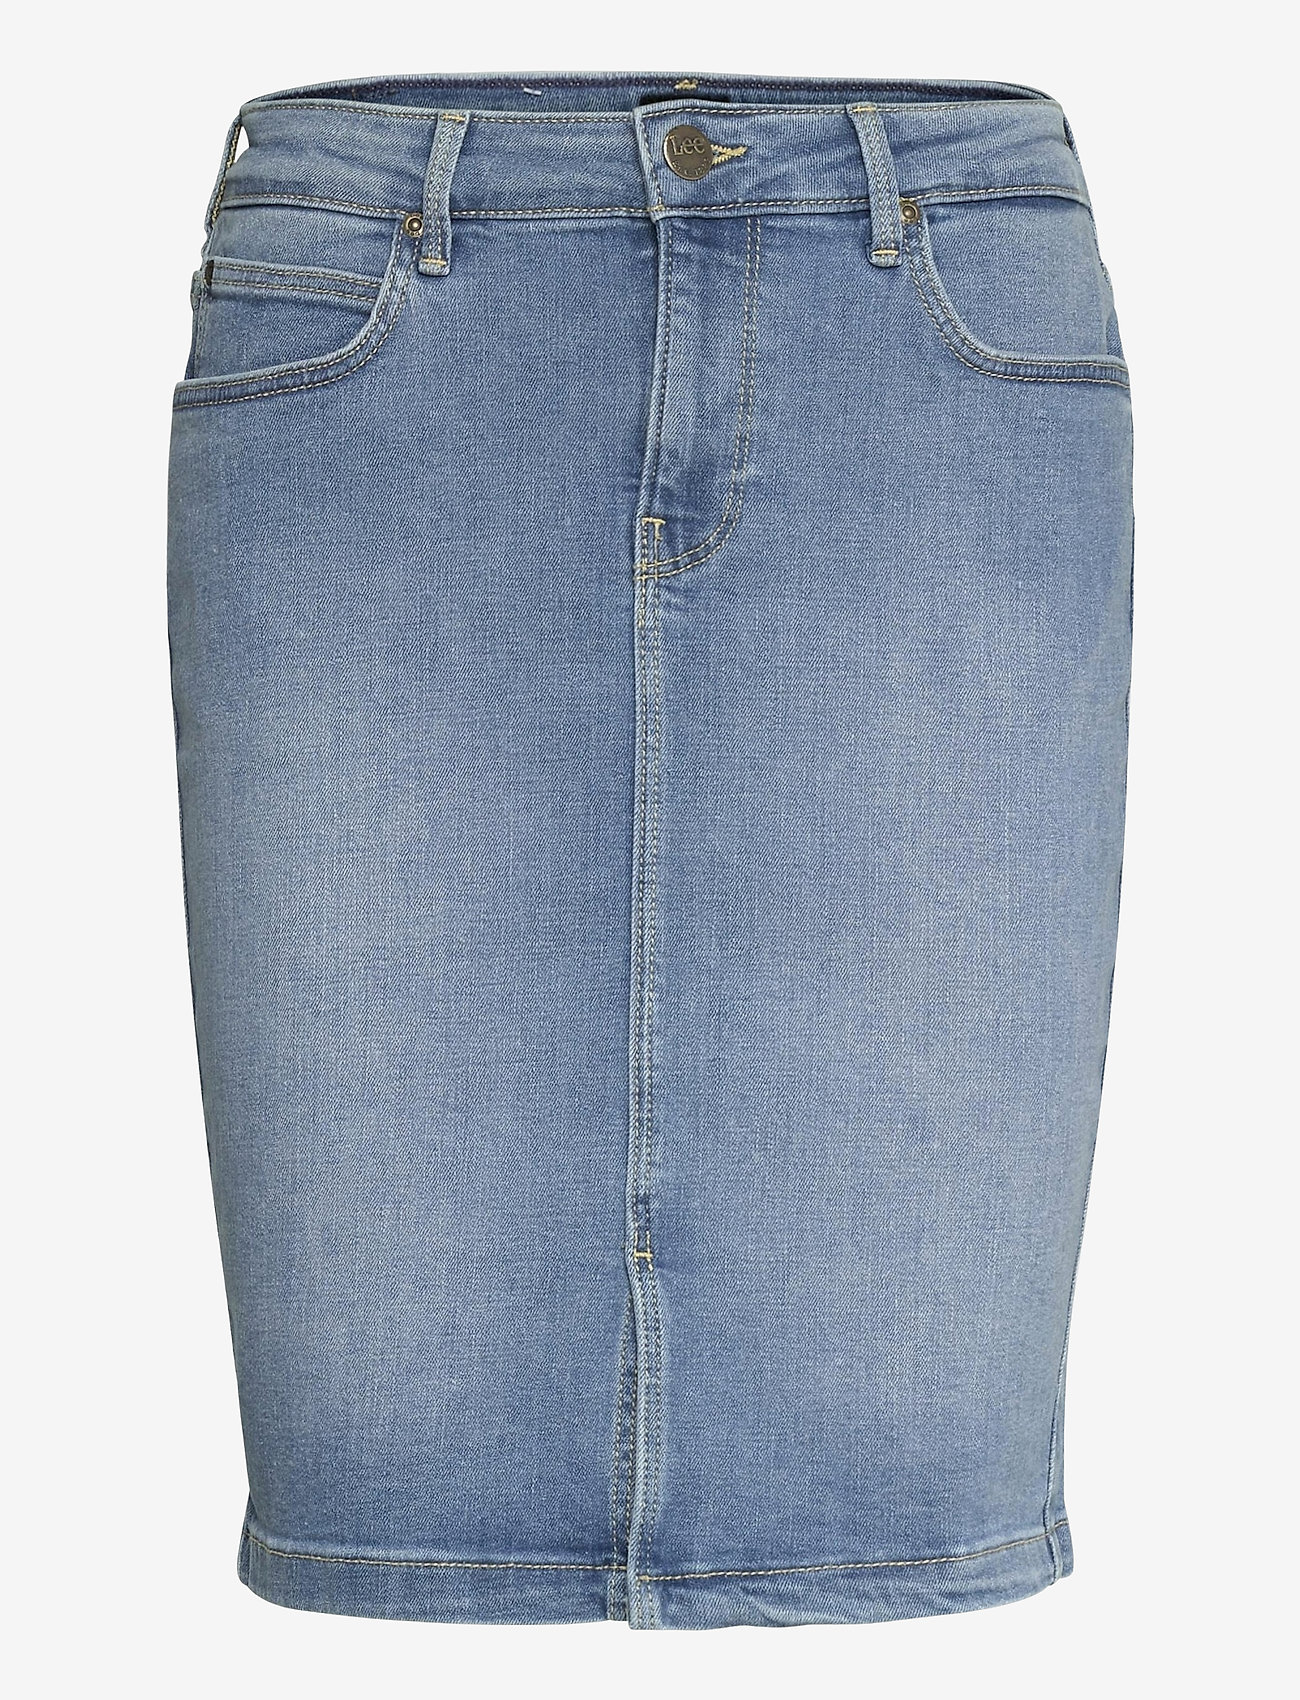 Lee Jeans - PENCIL SKIRT - jeansröcke - light lou - 0